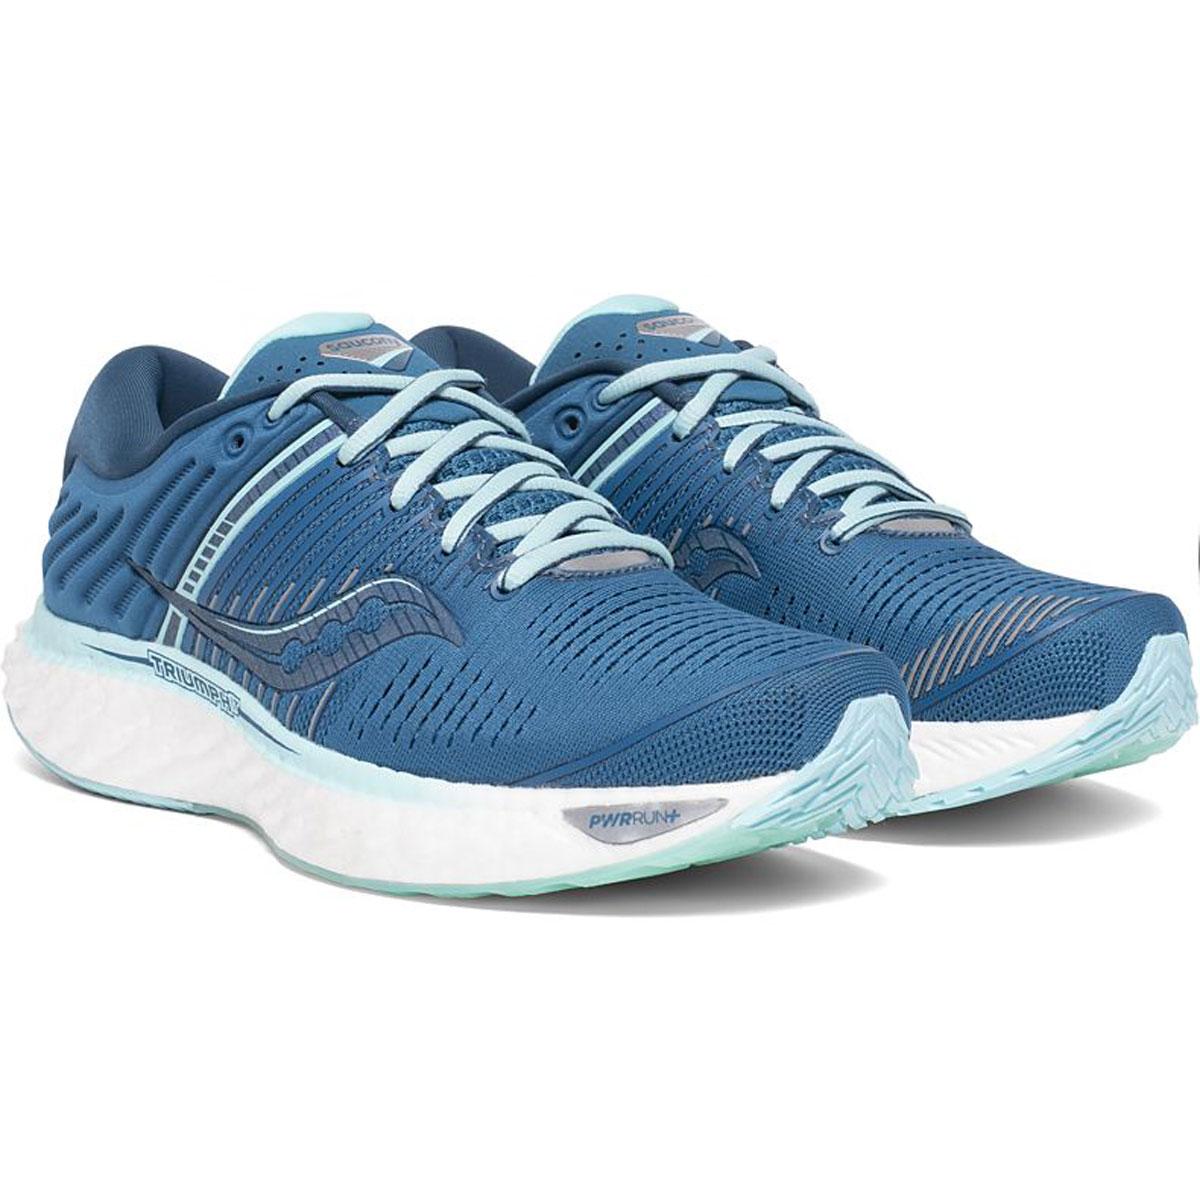 Women's Saucony Triumph 17 Running Shoe - Color: Blue/Aqua - Size: 5 - Width: Regular, Blue/Aqua, large, image 4